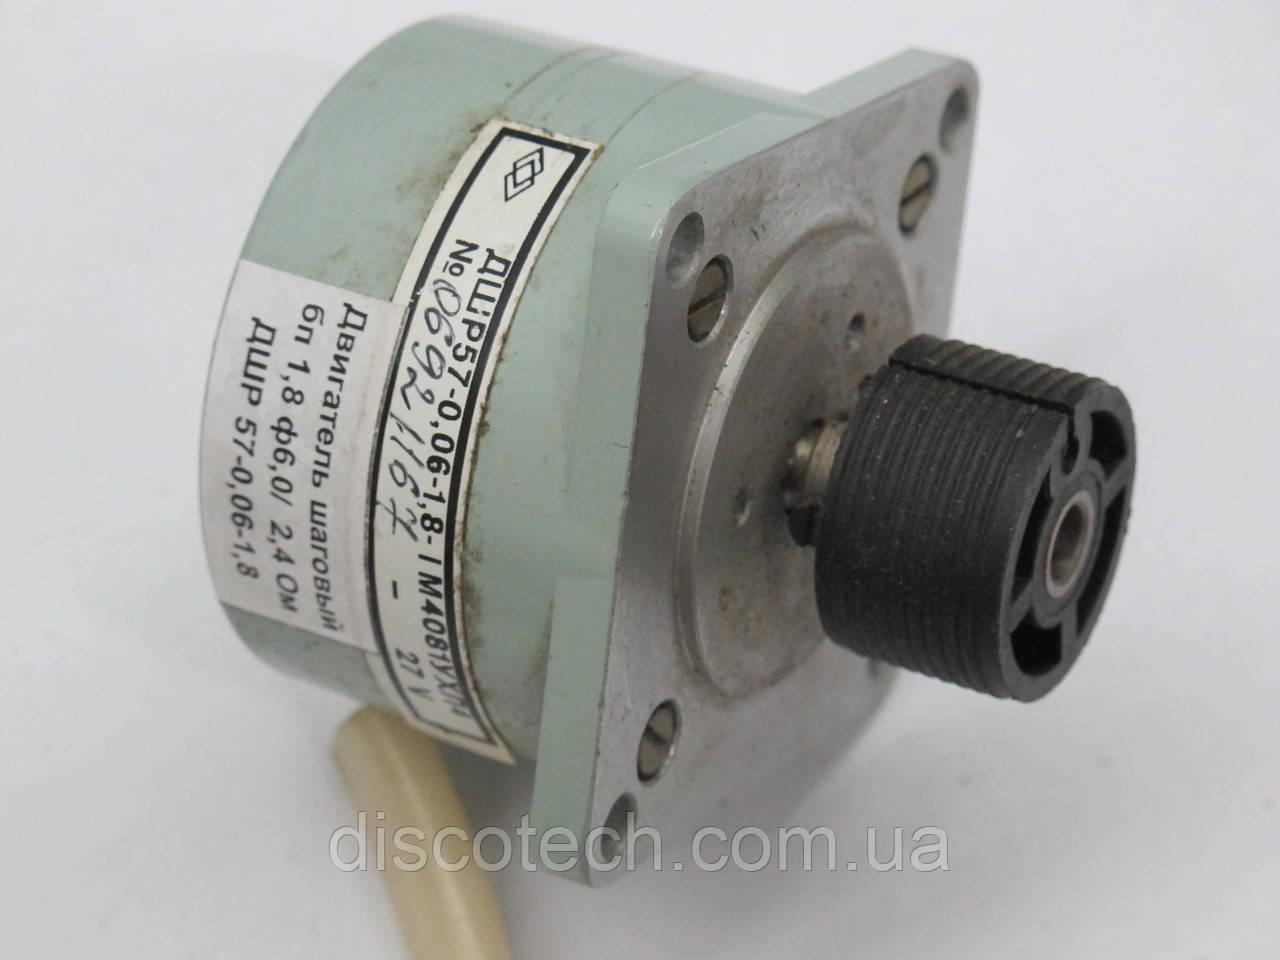 Двигатель шаговый бп 1,8 ф6,0/  2,4 Ом ДШР 57-0,06-1,8